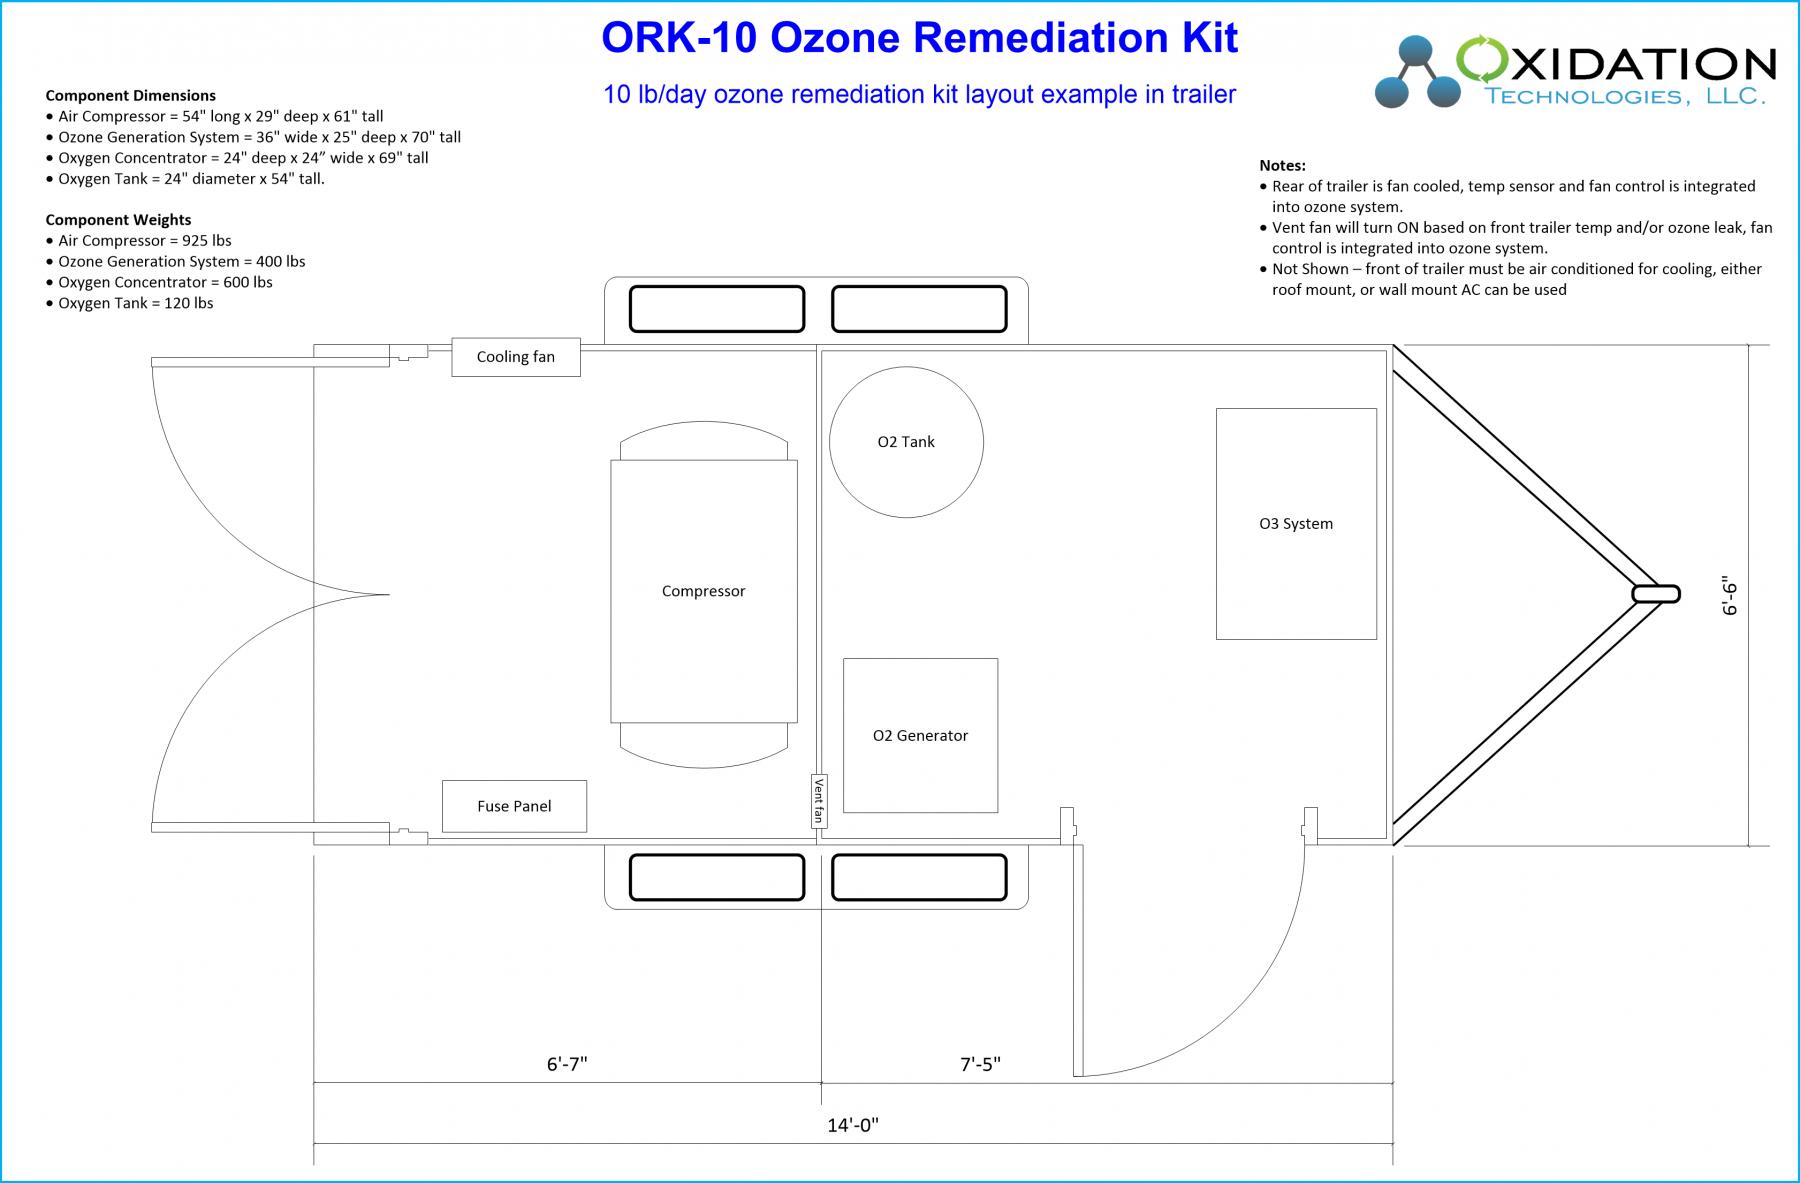 ORK-10 Modular ozone system trailer layout diagram